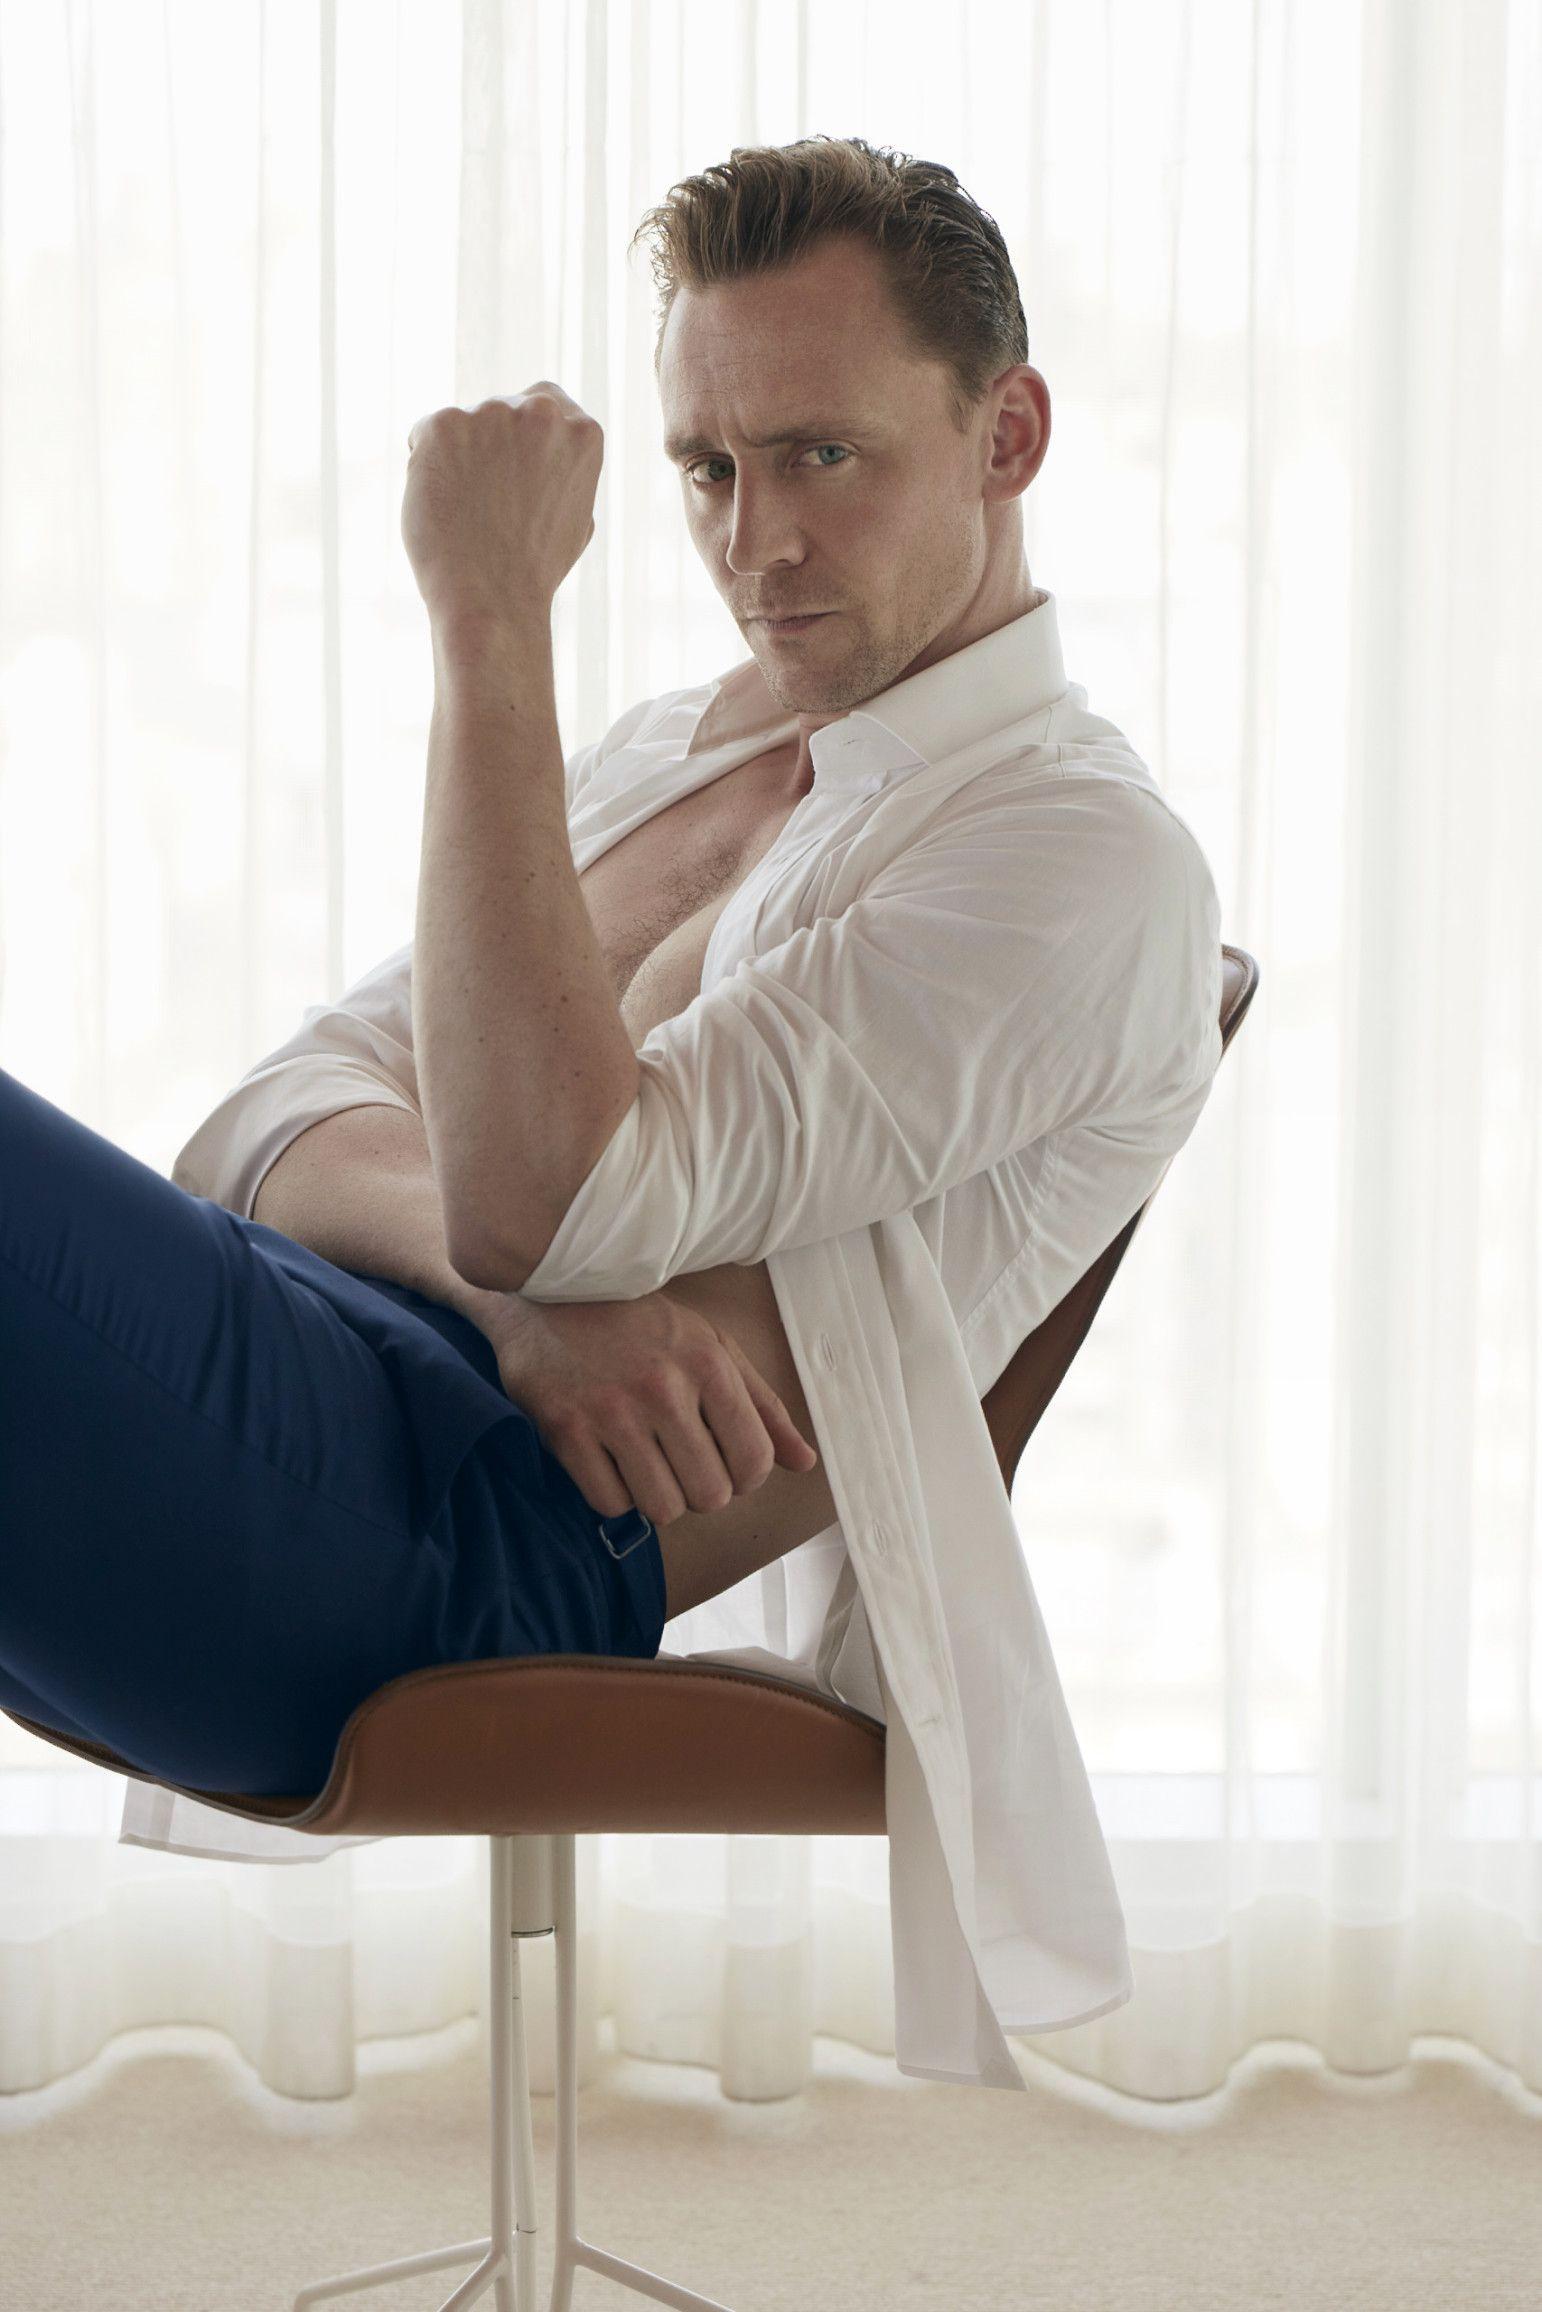 Tom Hiddleston Tunjukkan Tubuh Idealnya dalam Pemotretan untuk W Magazine